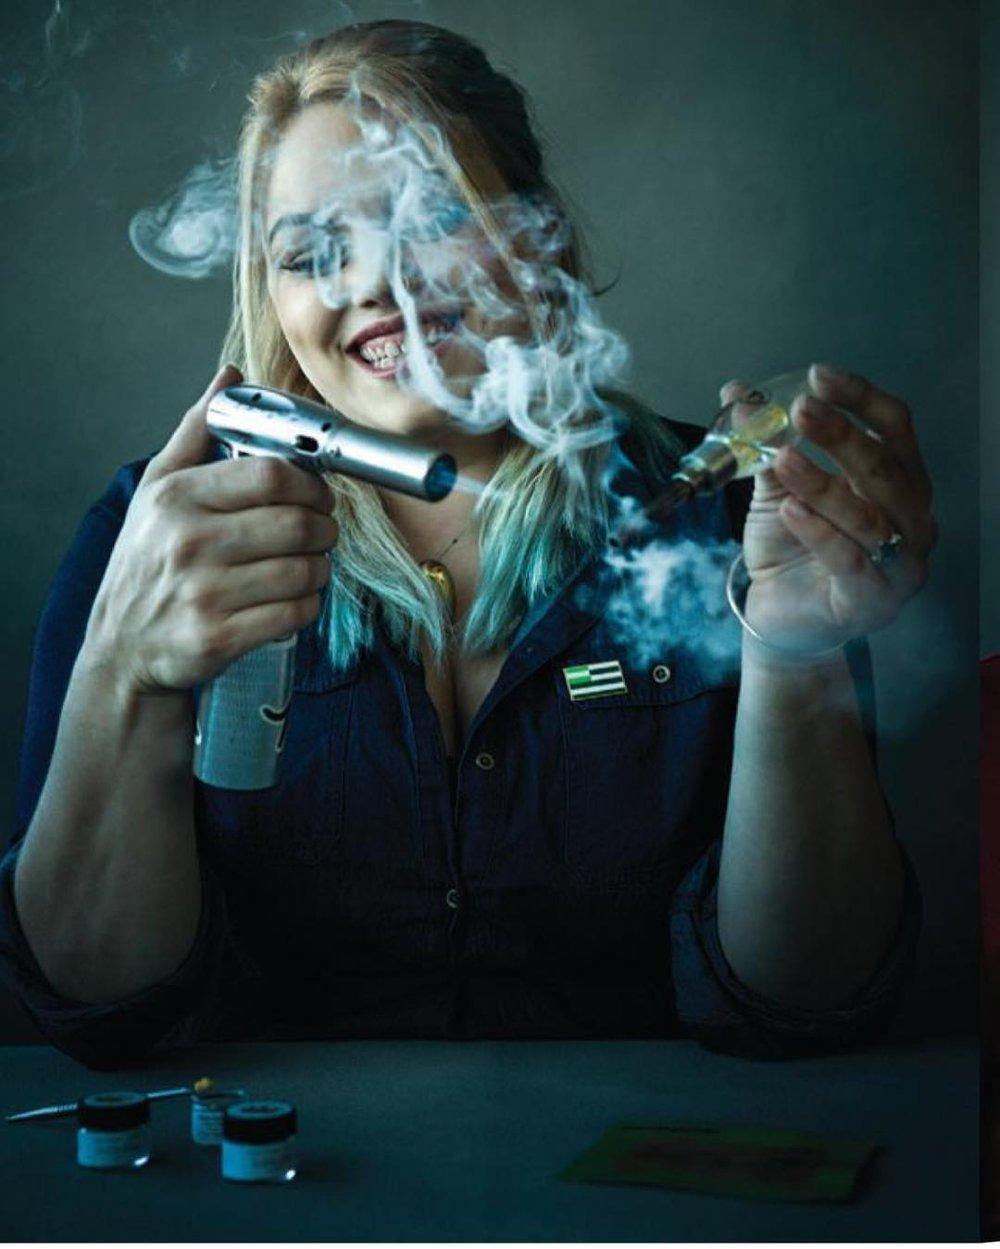 - Photo by: Jason Madra for SF Magazine